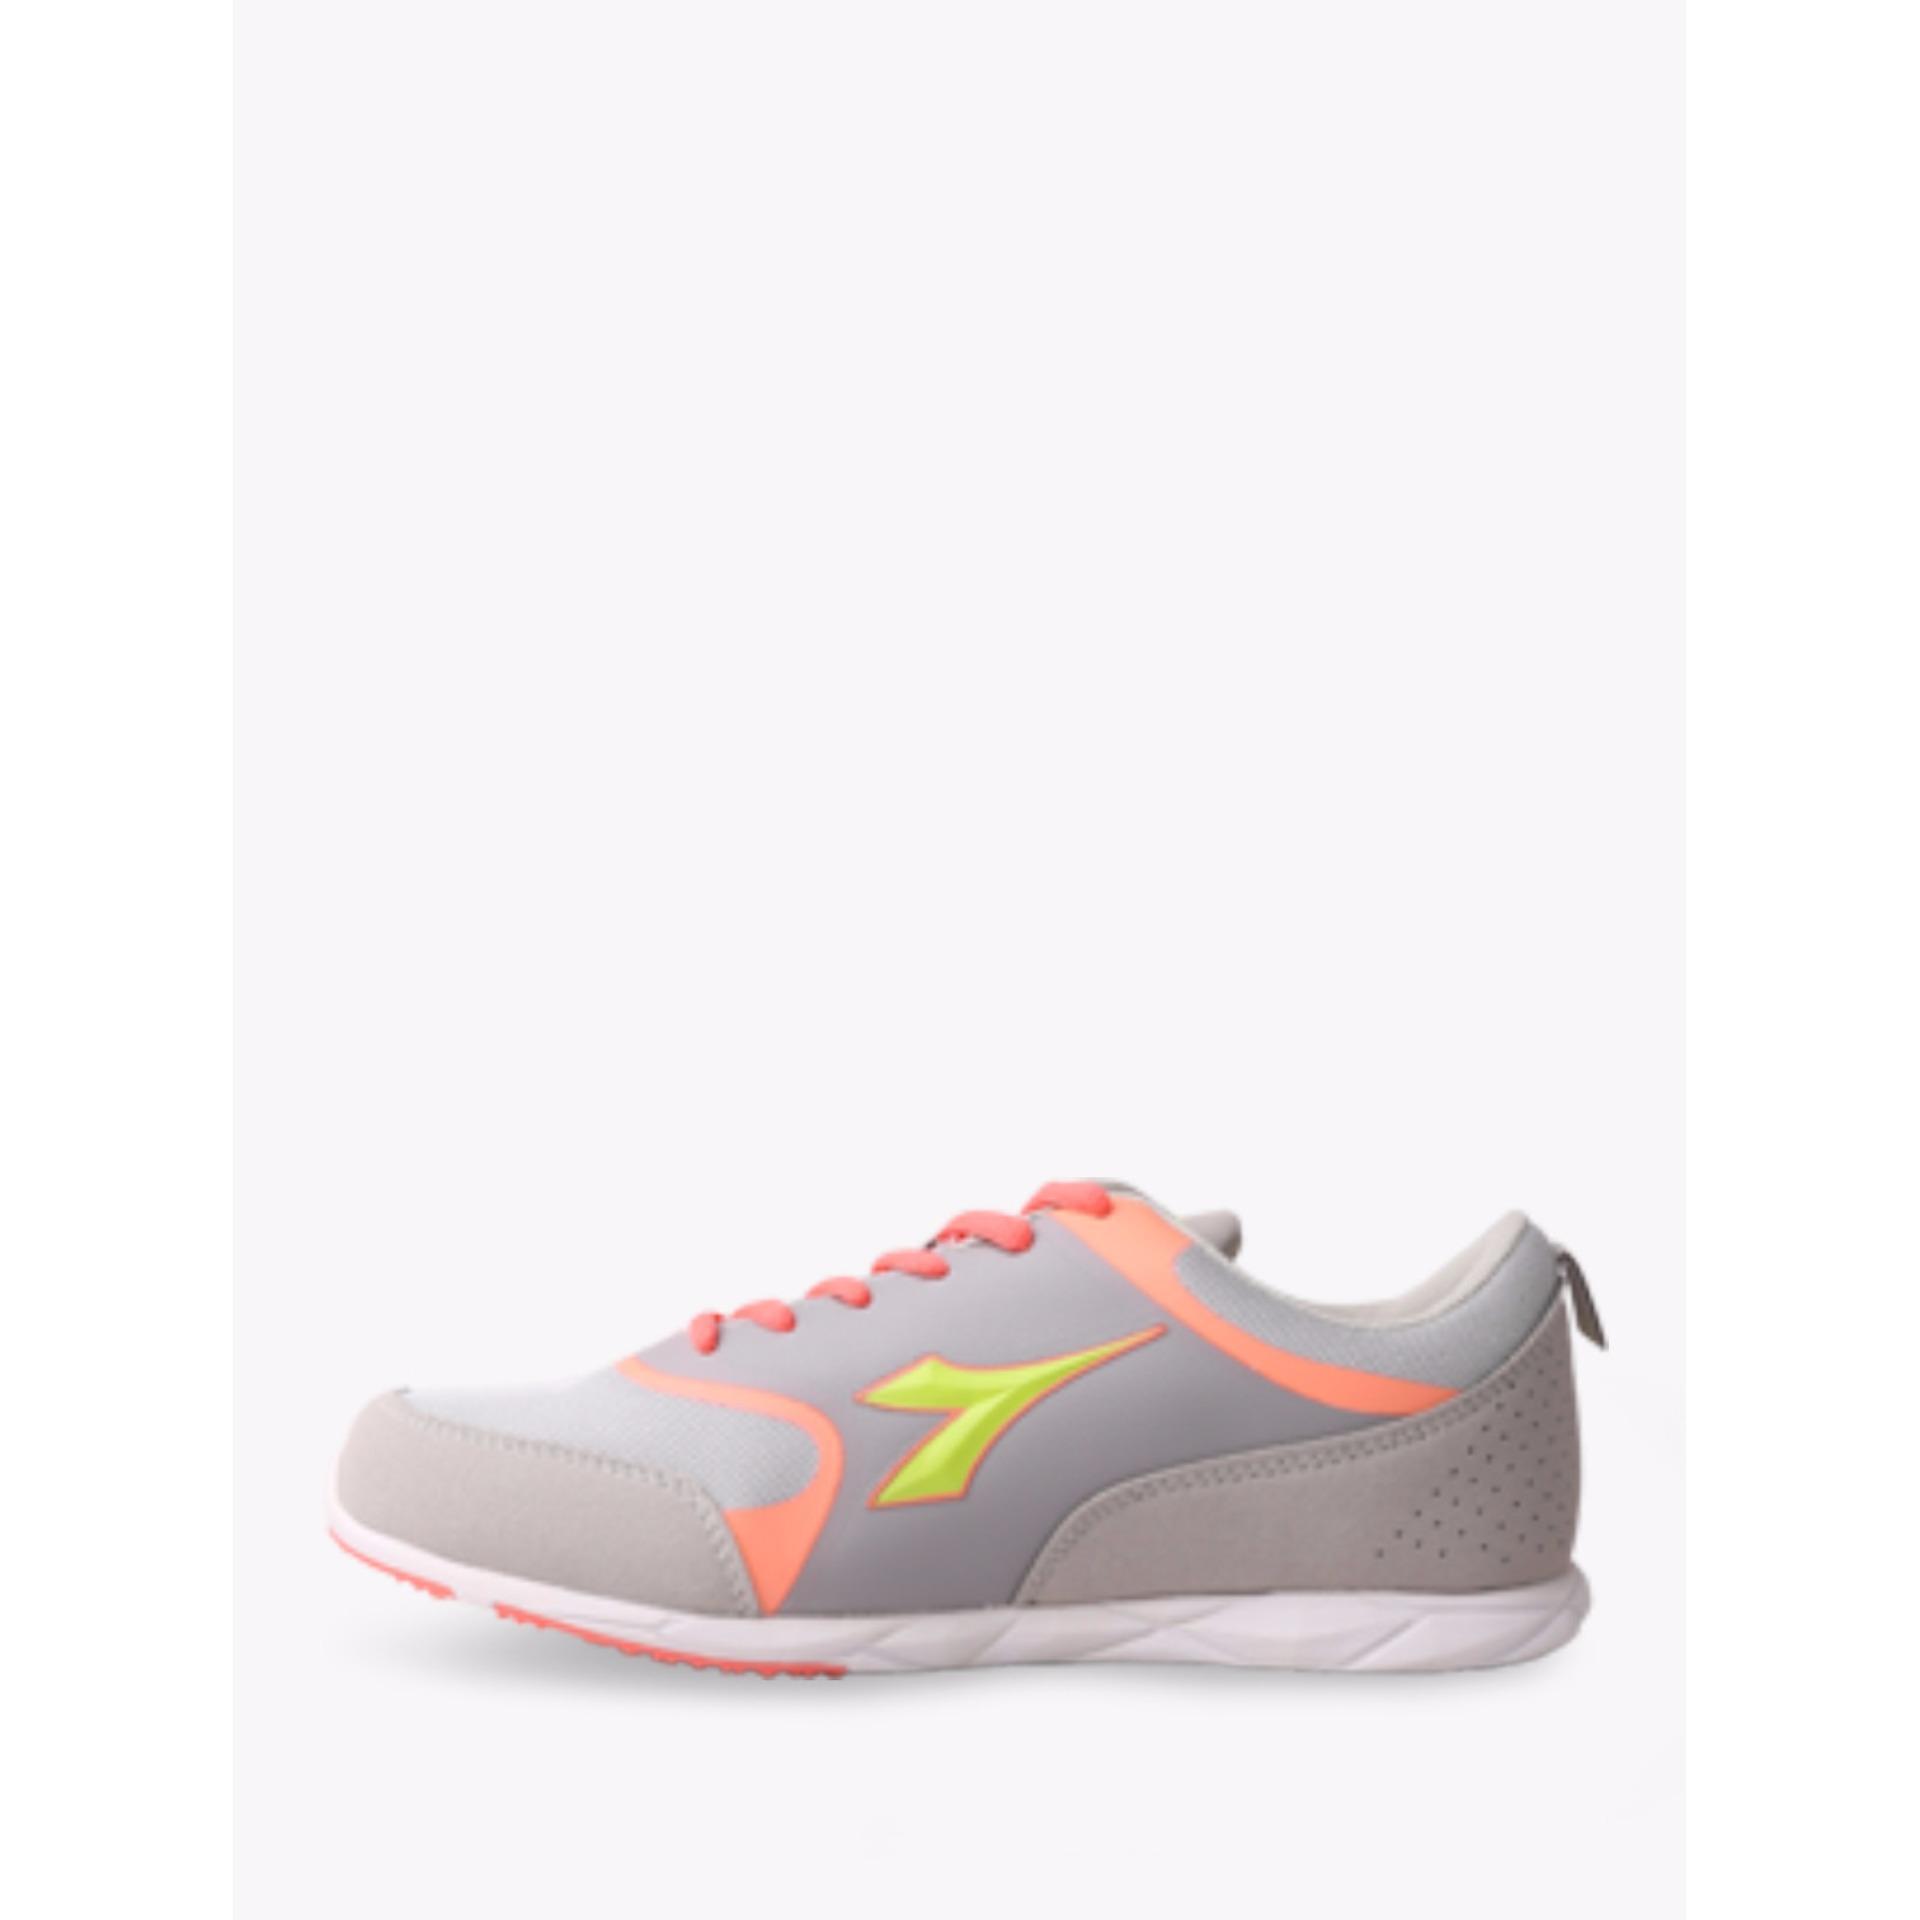 Liberta VII Women's Running Shoes - DIAWA6116GRS